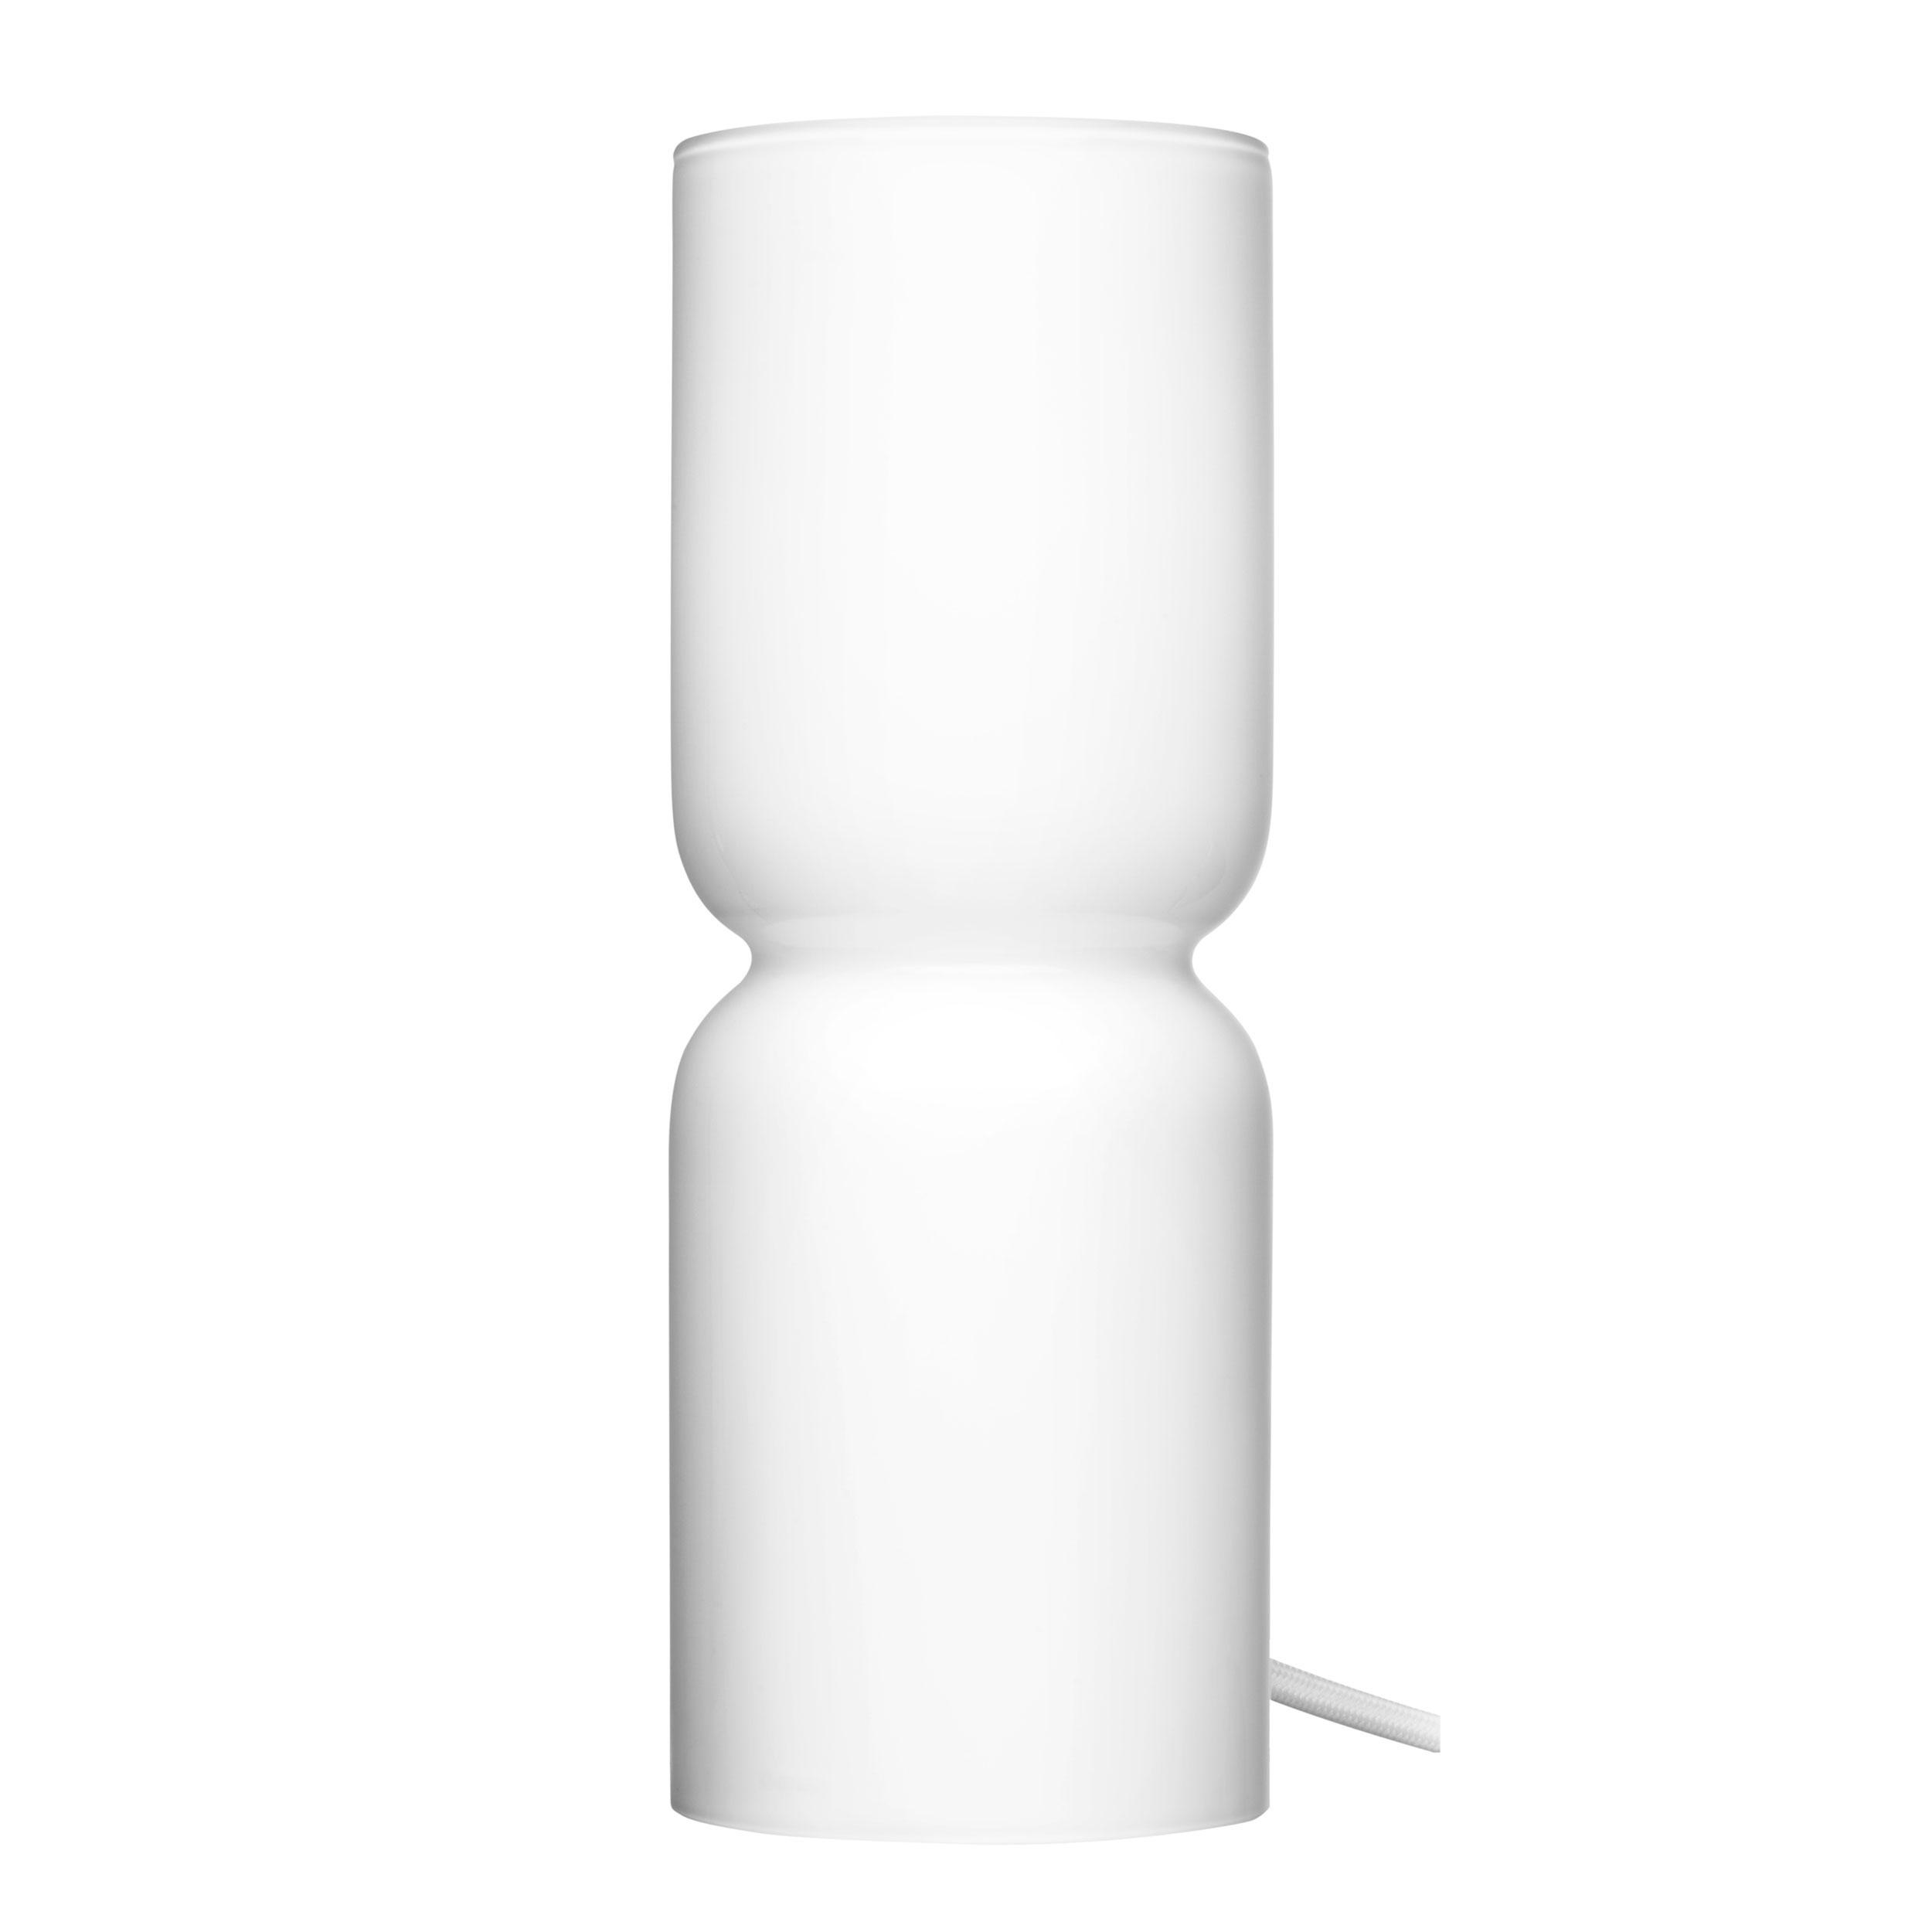 Iittala Lantern Lamp Table Light Table Lamp Floor Light Floor Lamp Glass White Opal 25 Cm 1009434 At About Tea De Shop